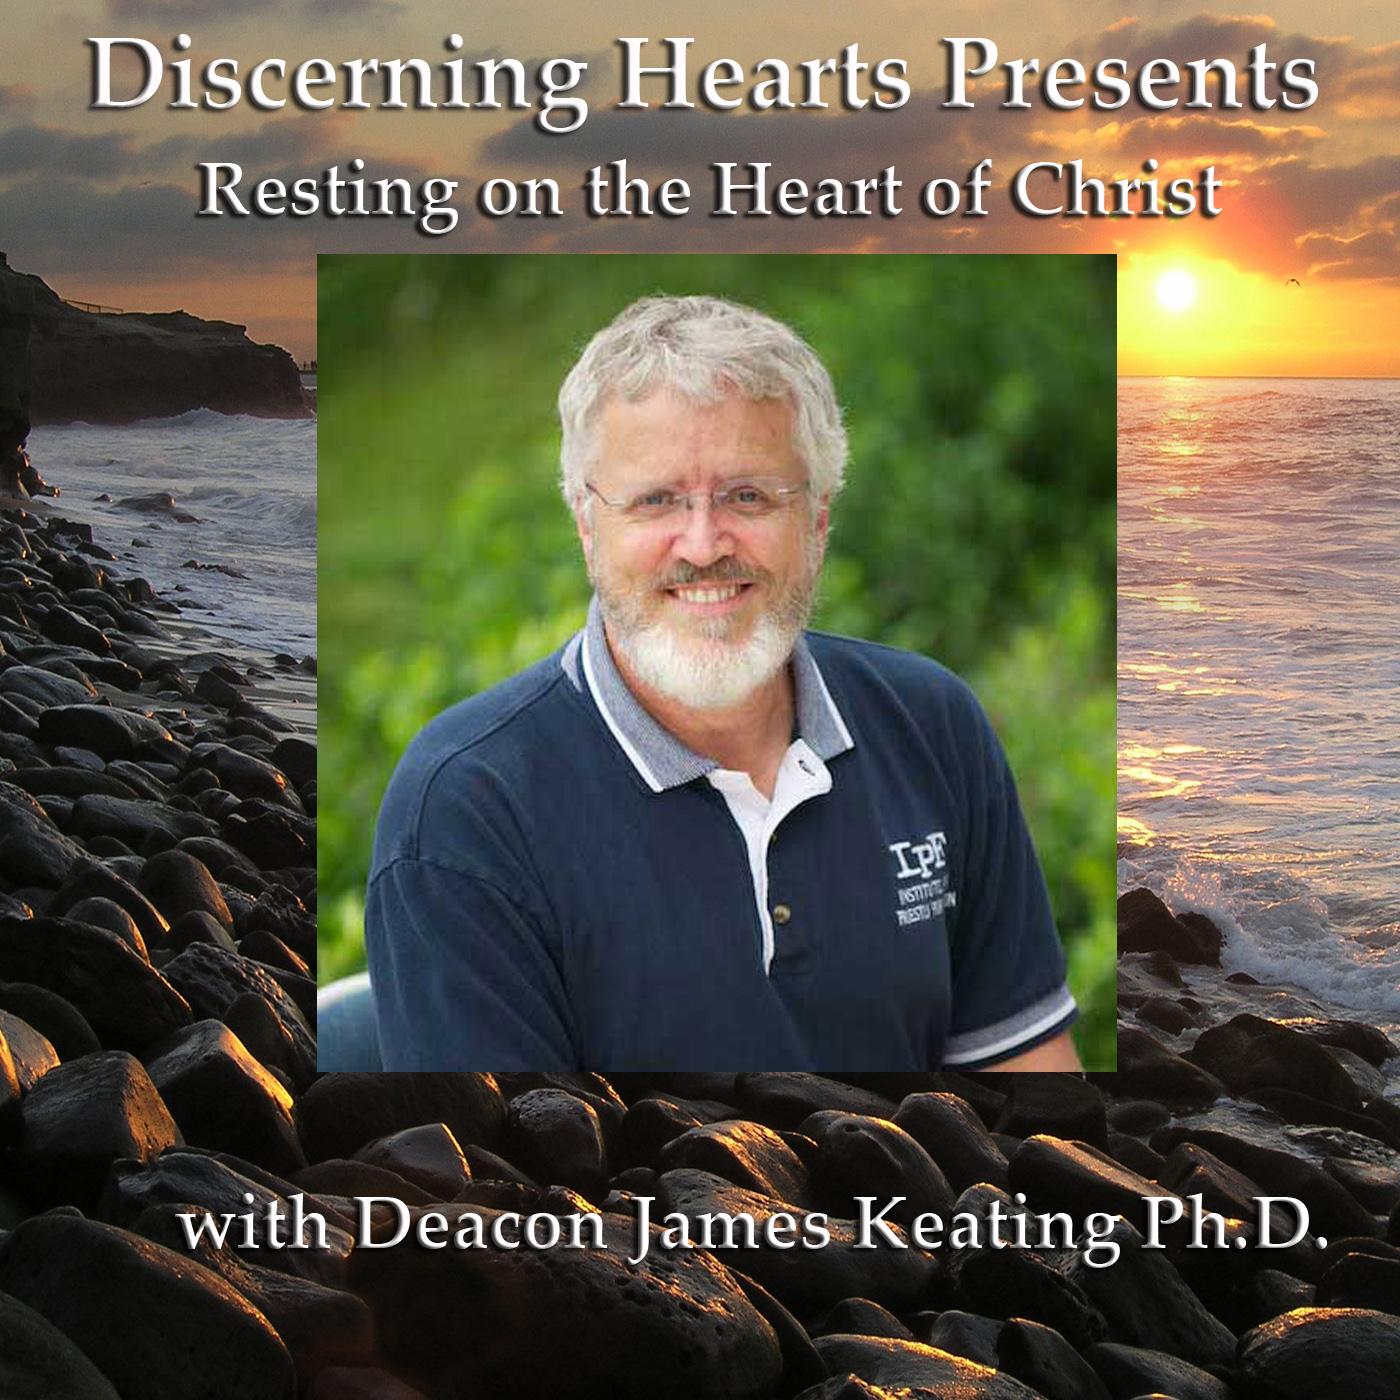 Discerning Hearts Catholic Podcasts » Deacon James Keating